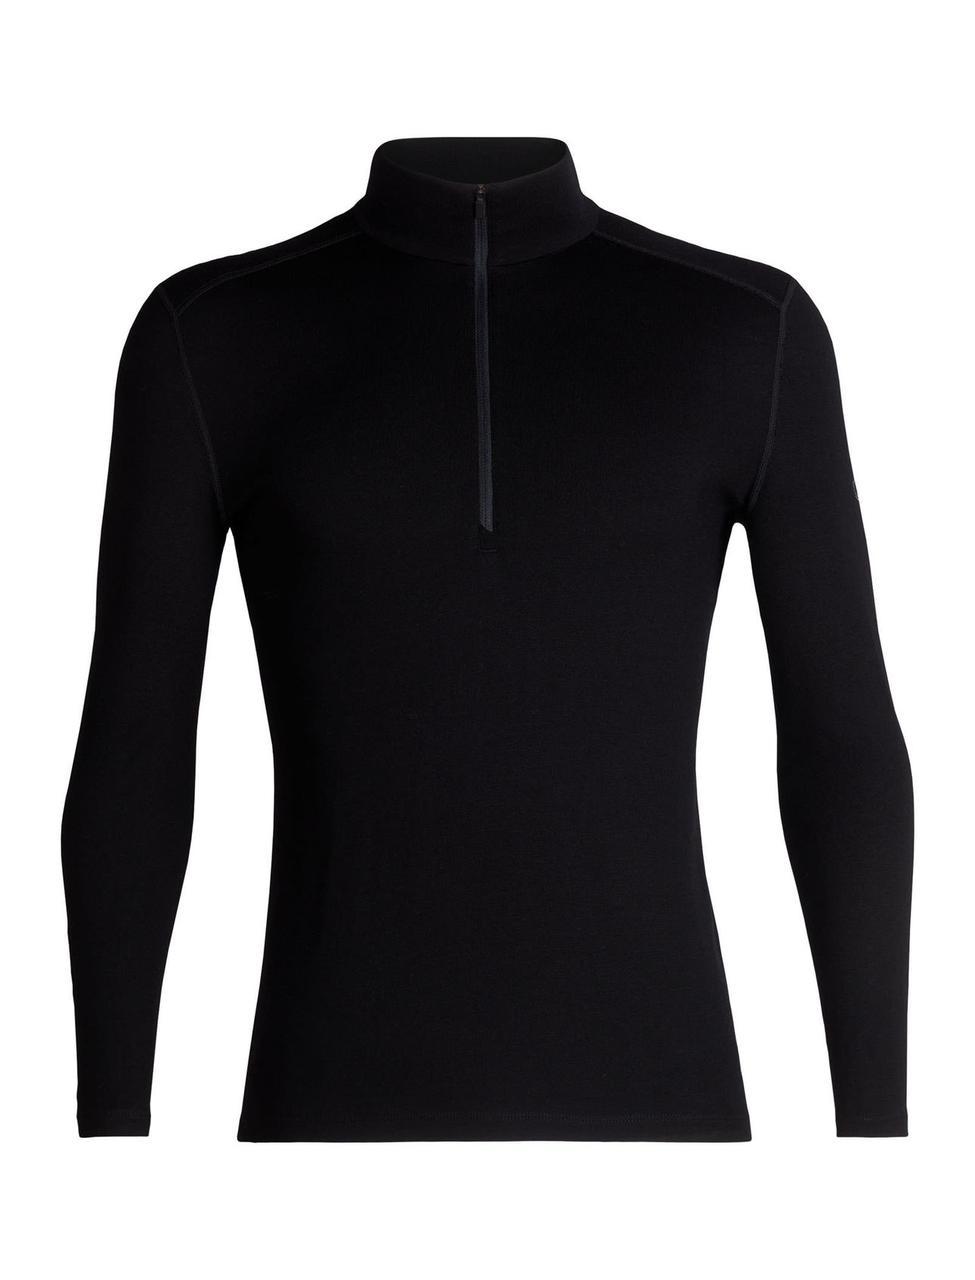 Термофутболка мужская Icebreaker 260 Tech Long Sleeve Half Zip Black L (104 372 001 L)